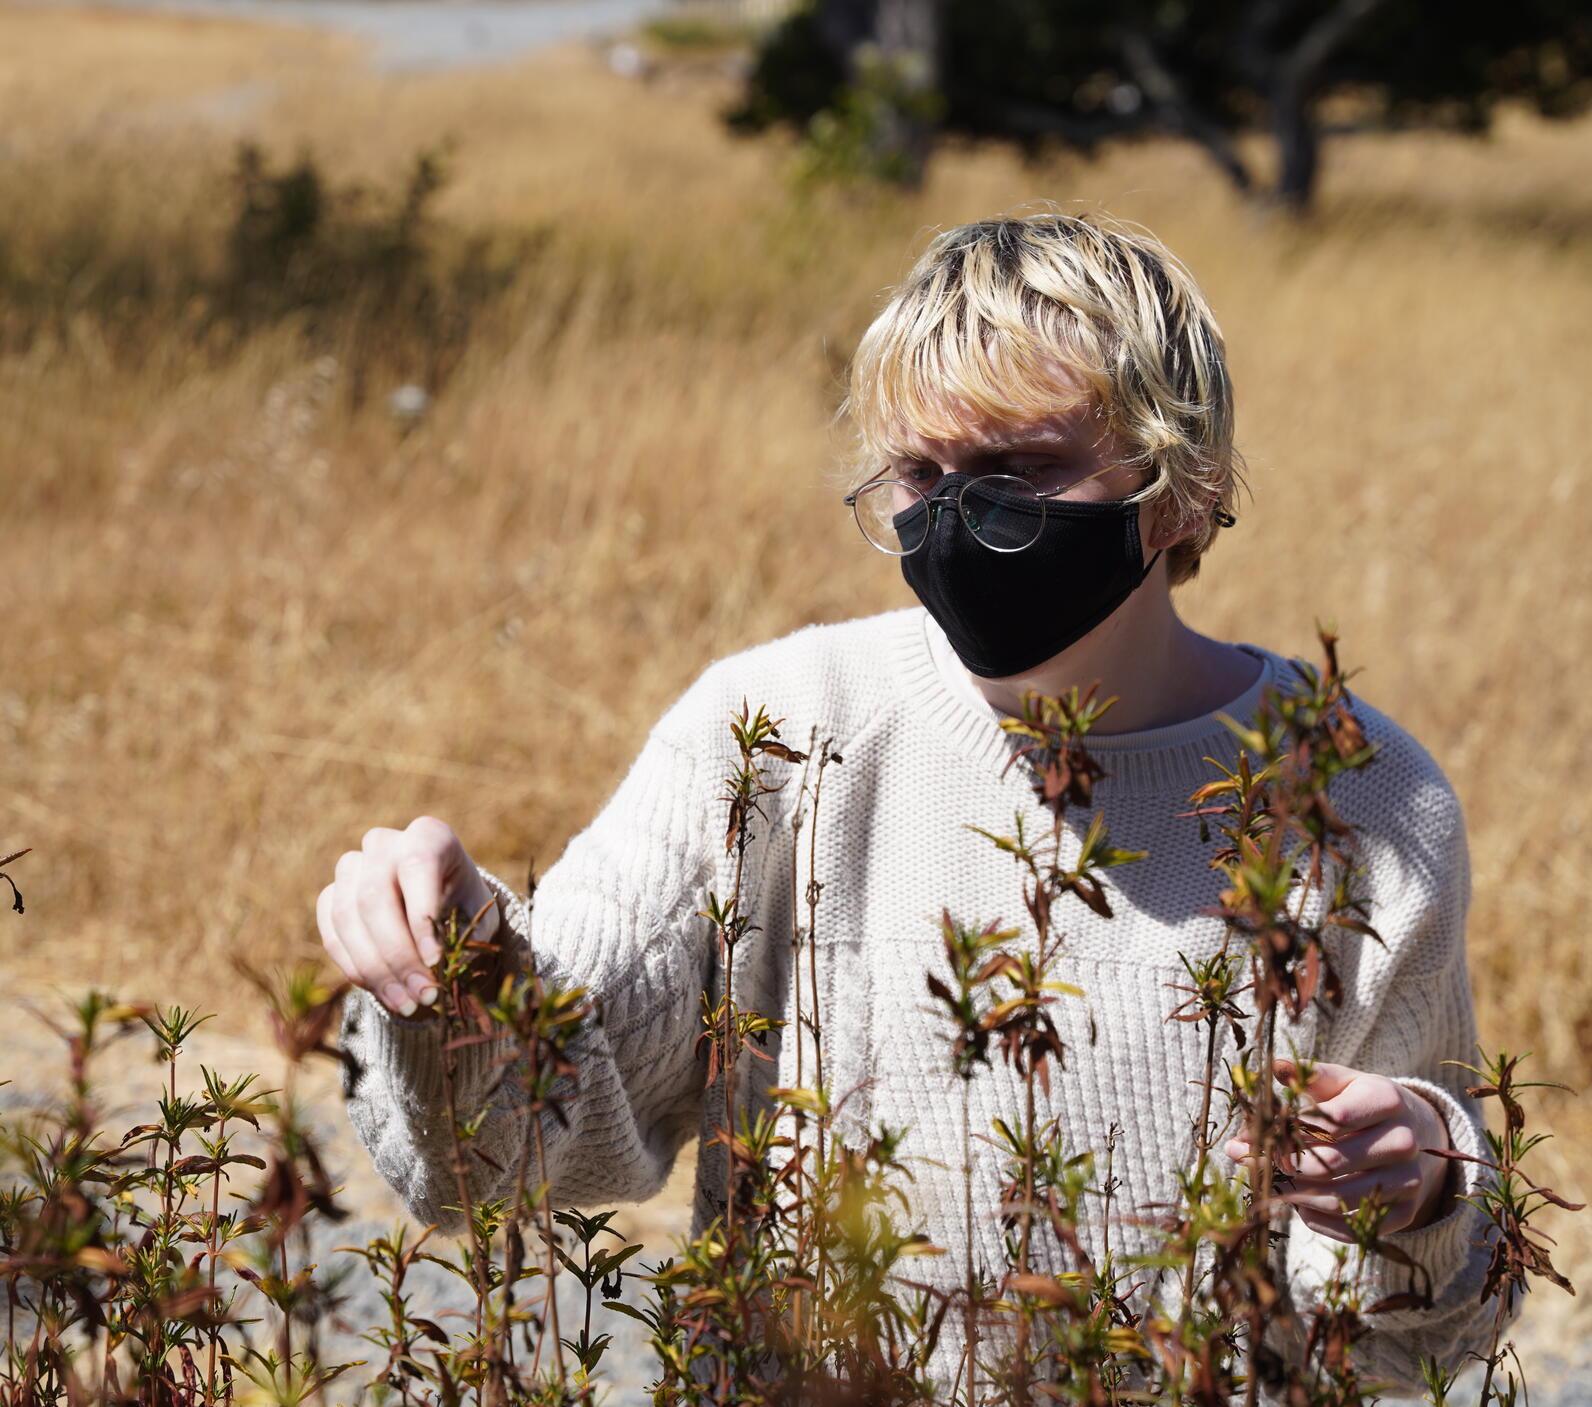 Arcadia Thompson Picking Flower Seeds